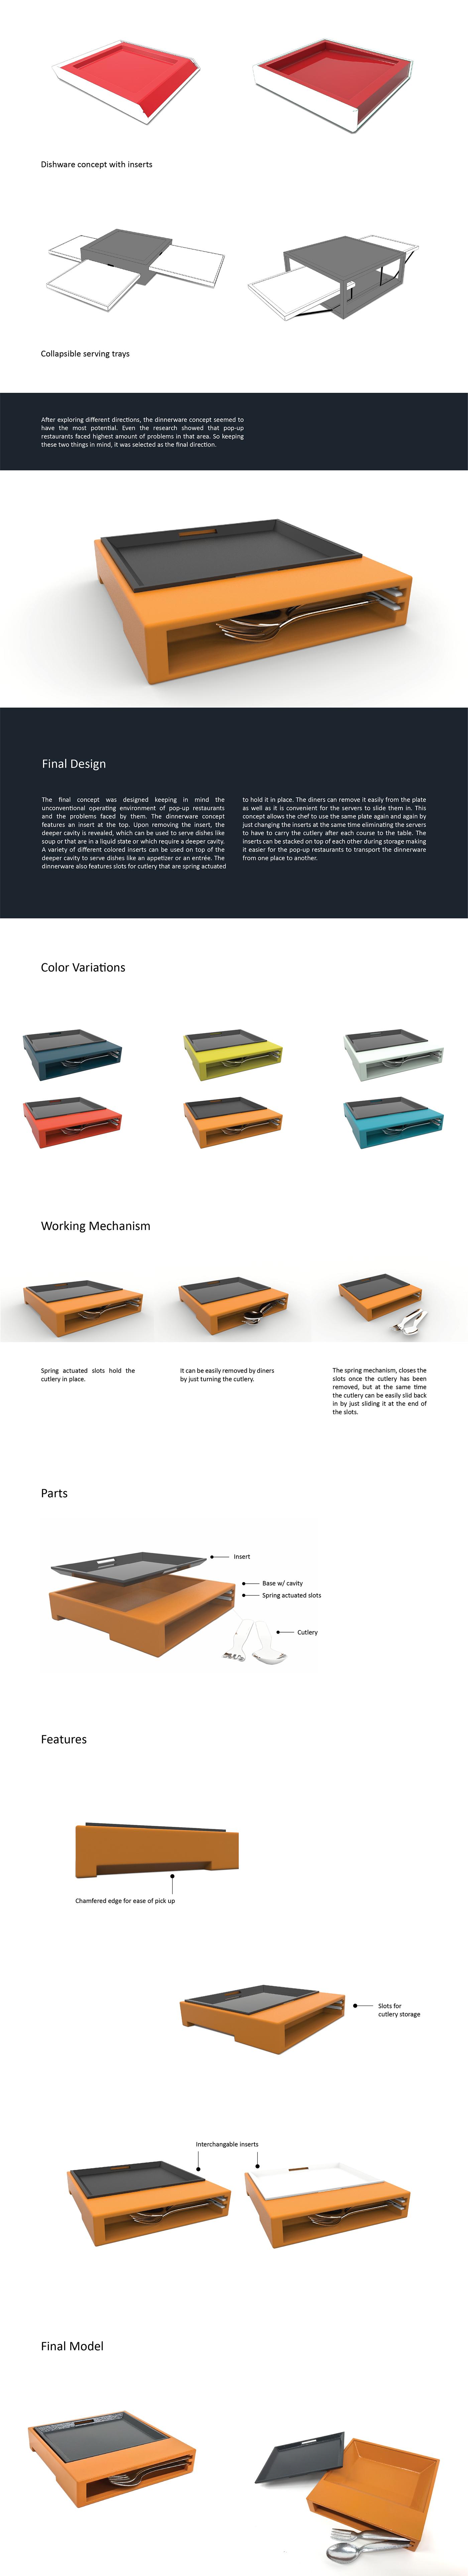 dinnerware Dishware Concept pop-up Digital Modeling